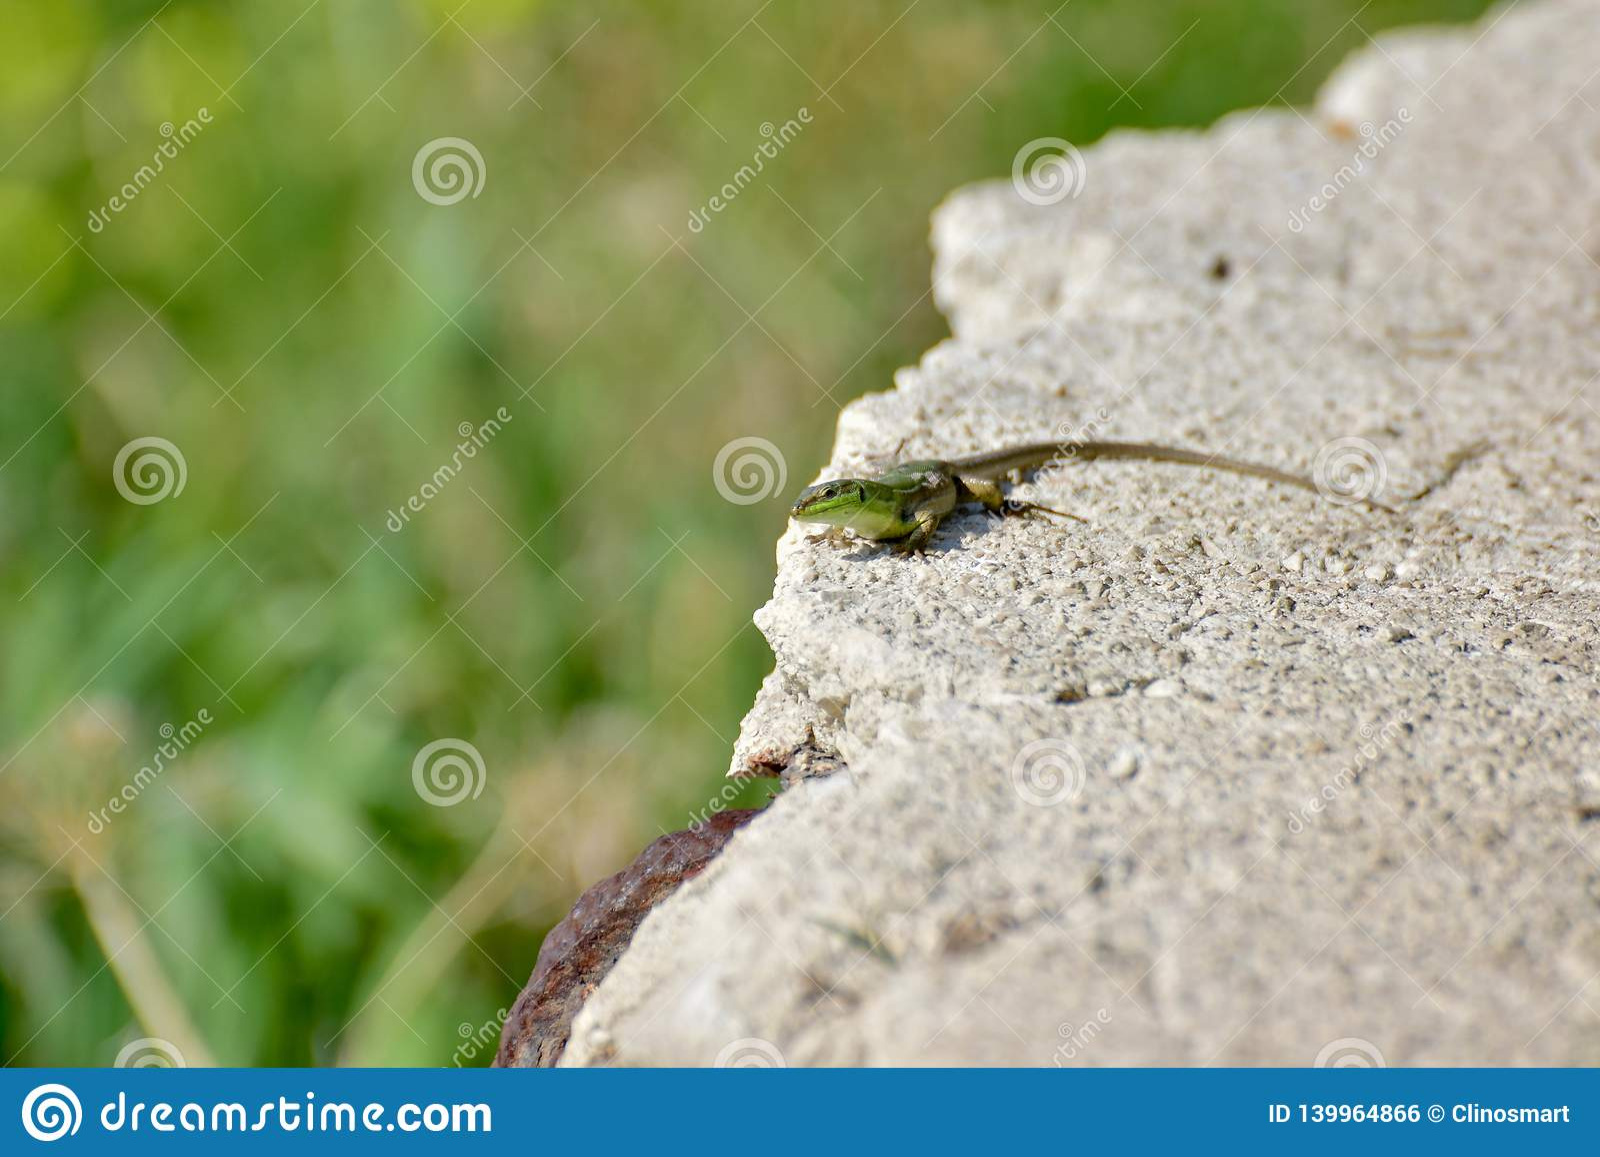 Un petit regard vert de llizard